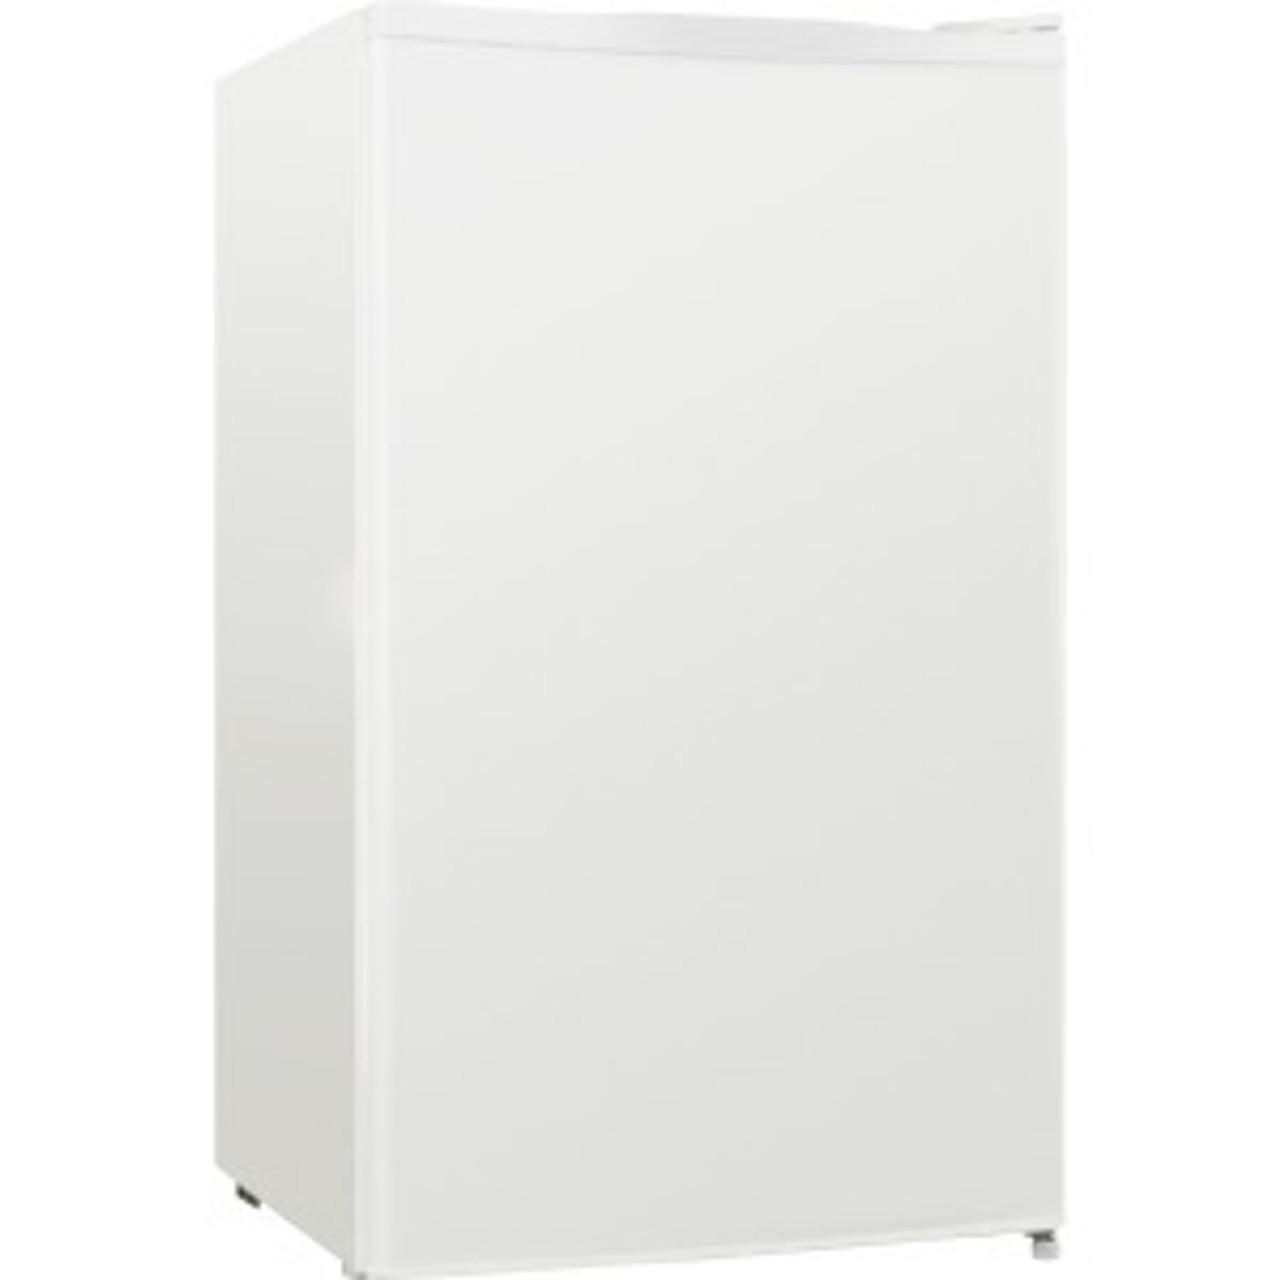 Lorell LLR72312 Compact Refrigerator, Can Dispenser, Dial Control, Manual Defrost, 3.3 cubic feet